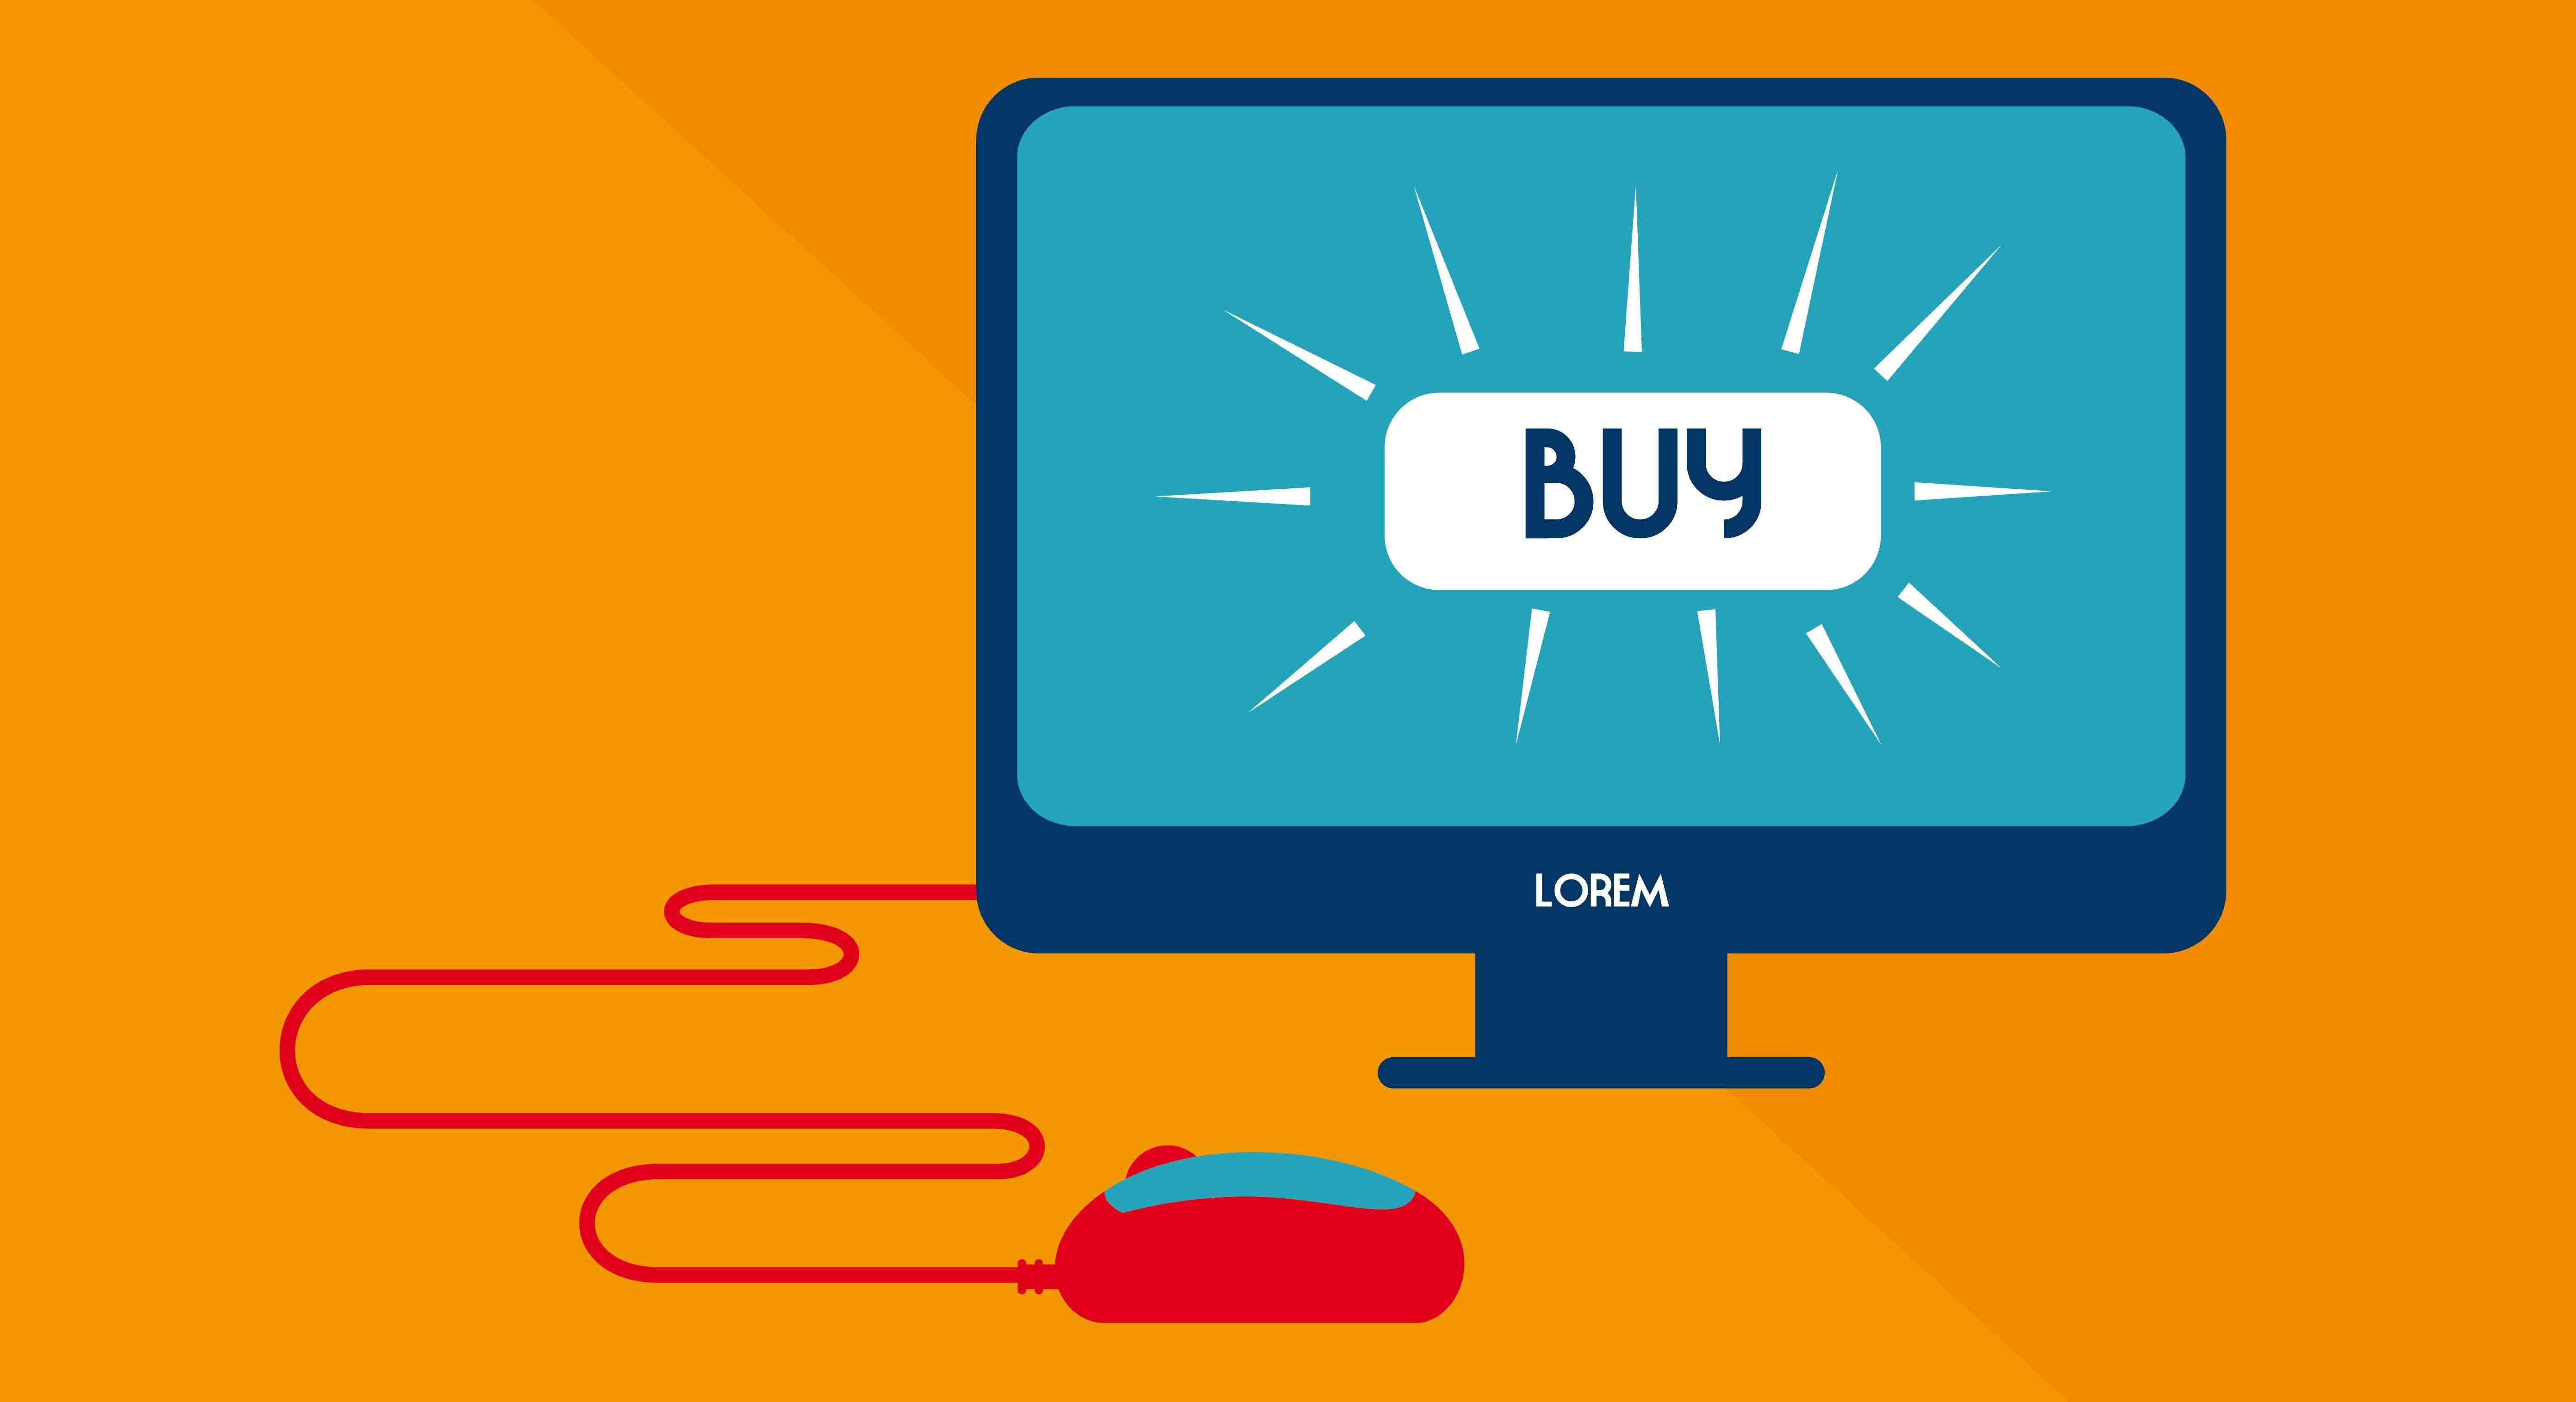 is-it-cheaper-to-buy-tyres-online